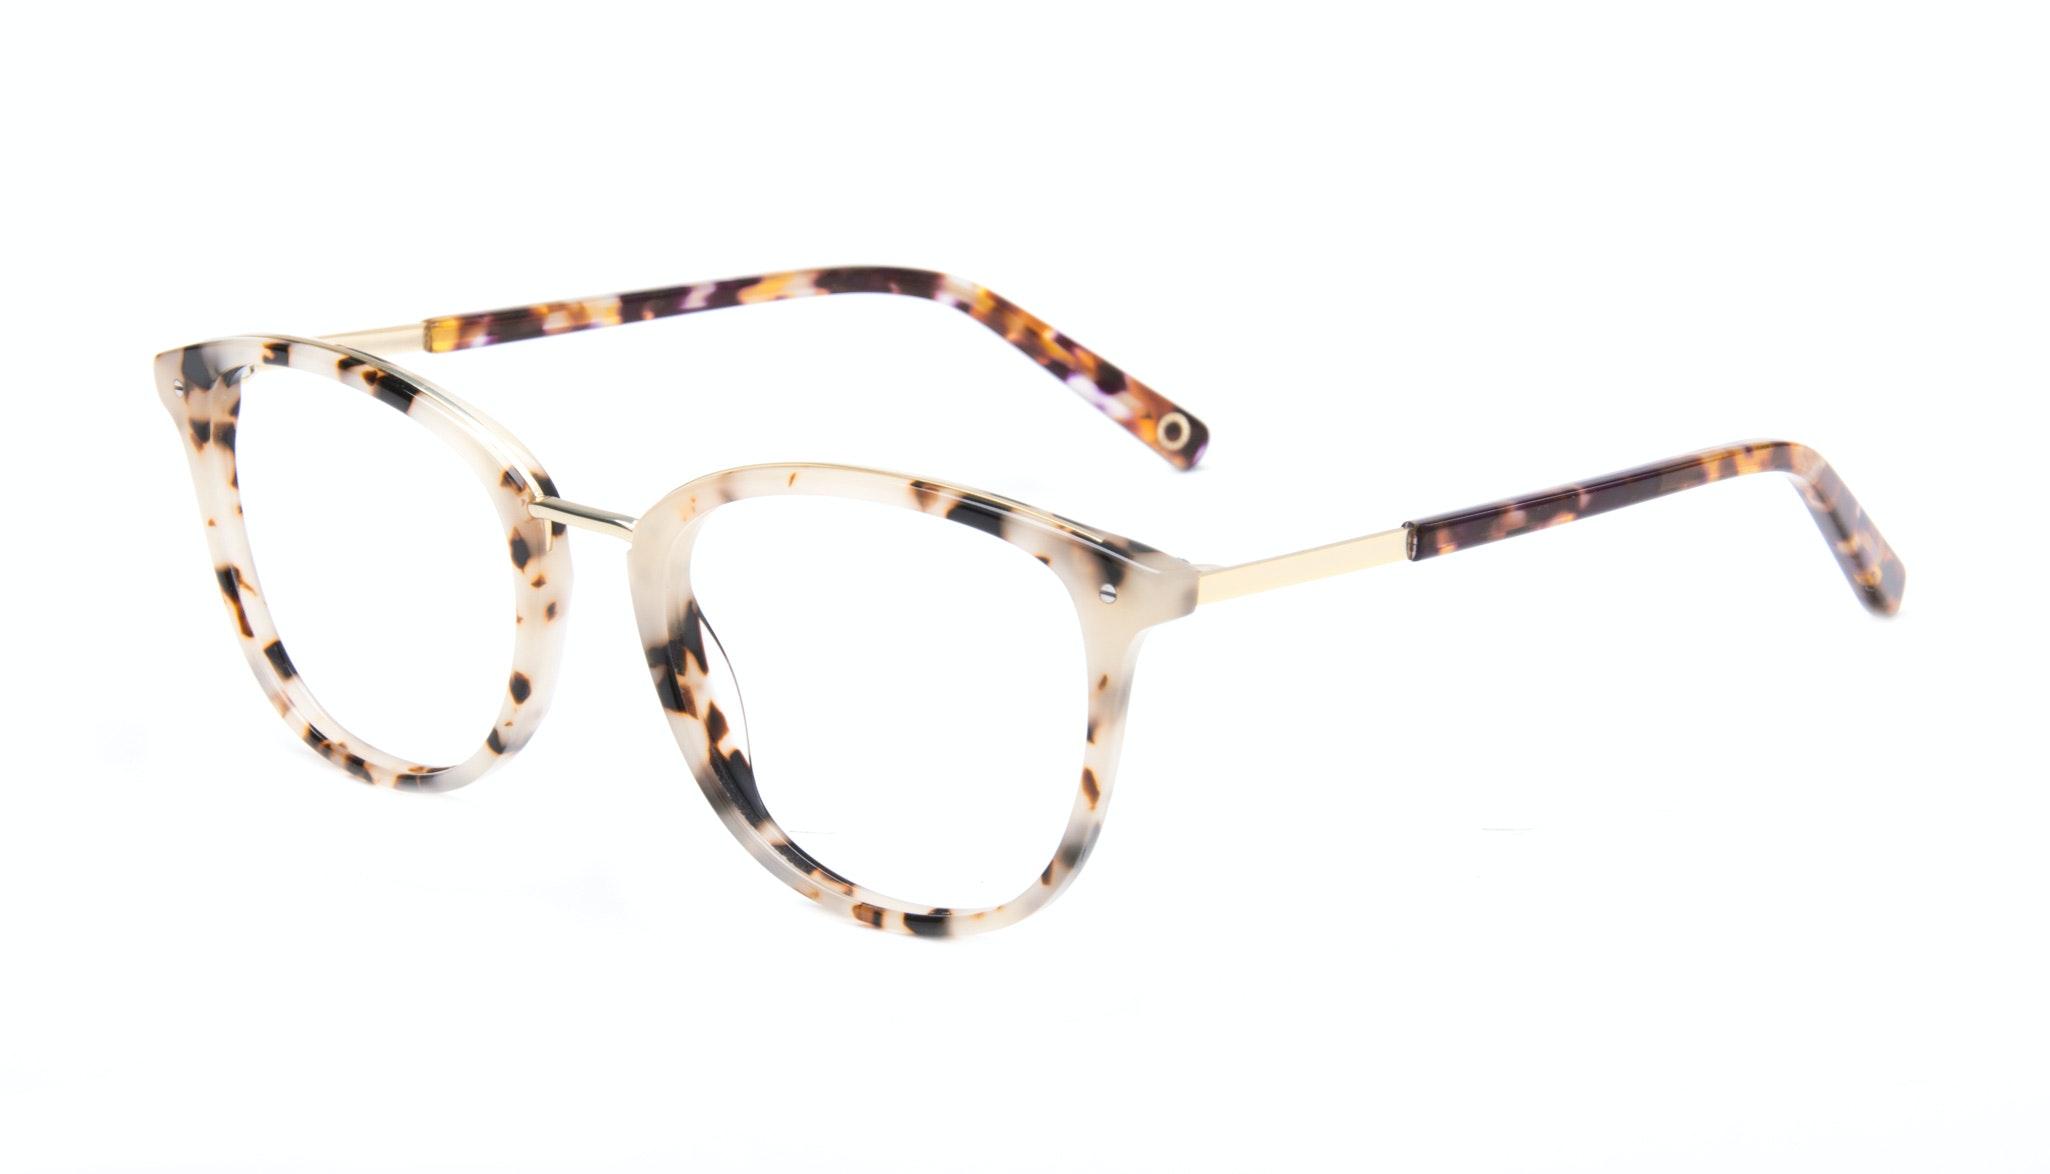 Affordable Fashion Glasses Square Round Eyeglasses Women Ella Gold Tortie Tilt